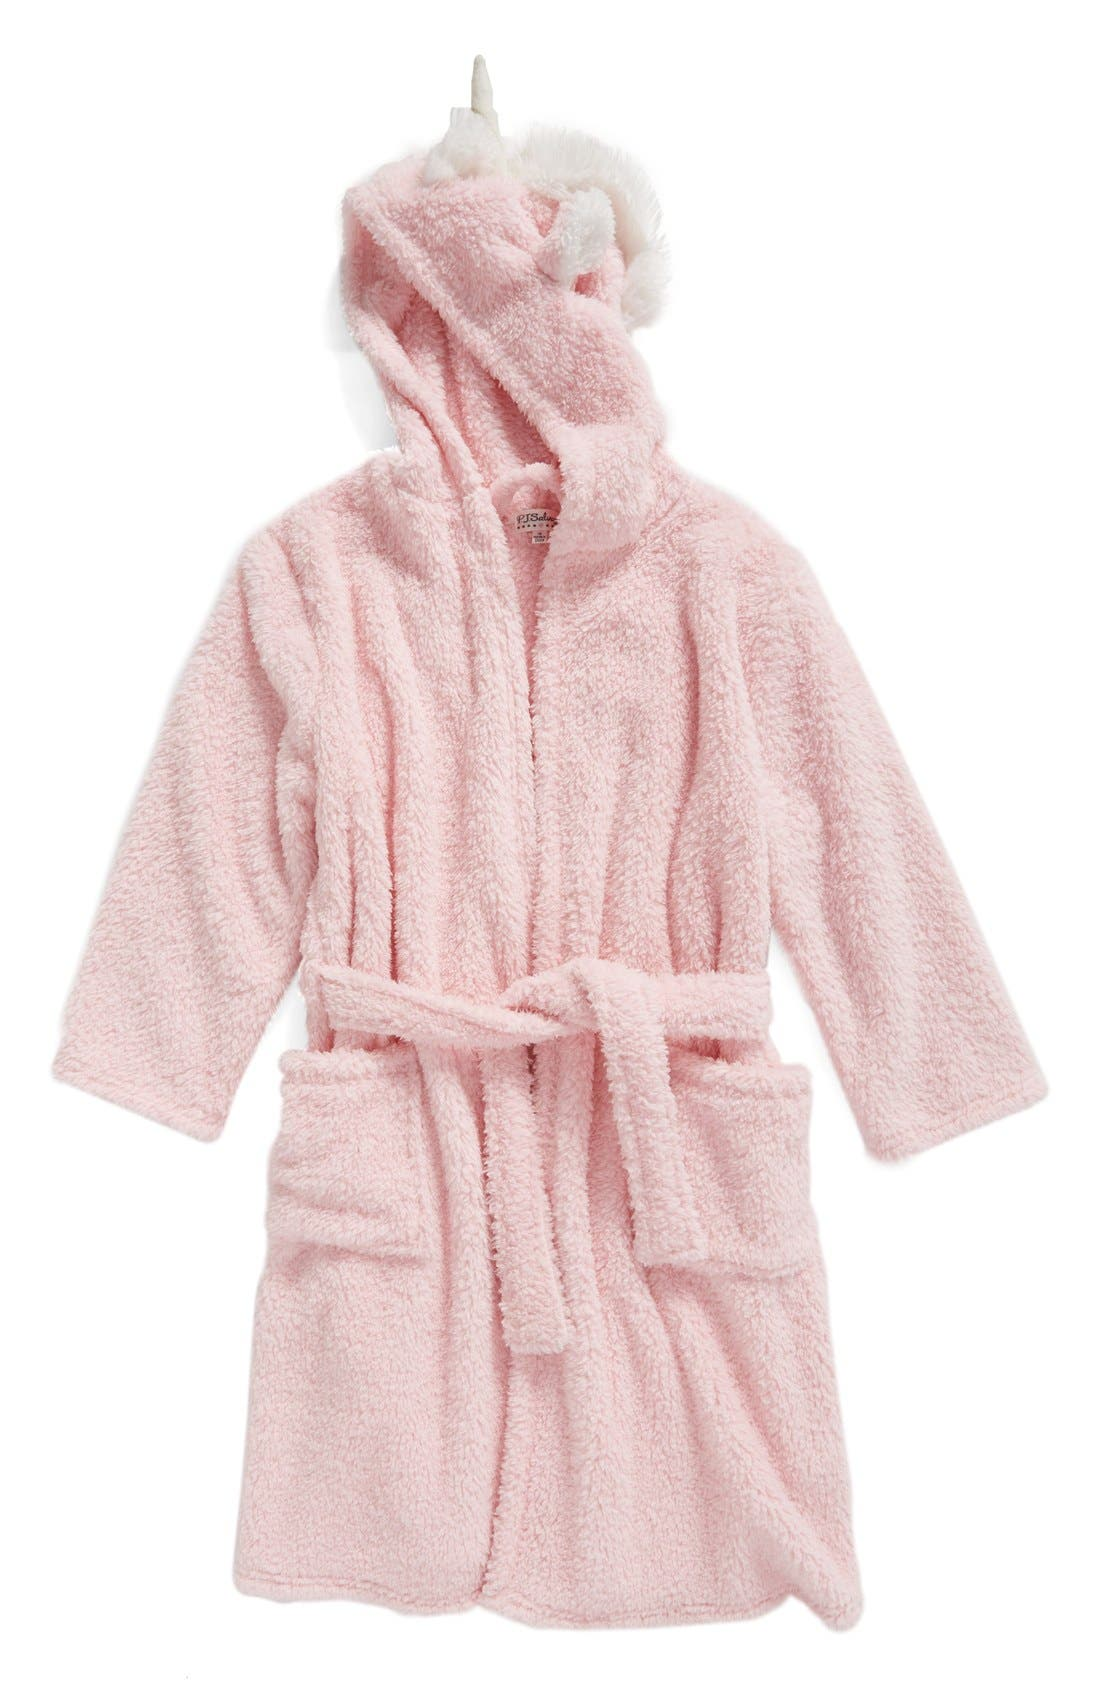 Main Image - PJ Salvage Unicorn Hooded Robe (Little Girls & Big Girls)